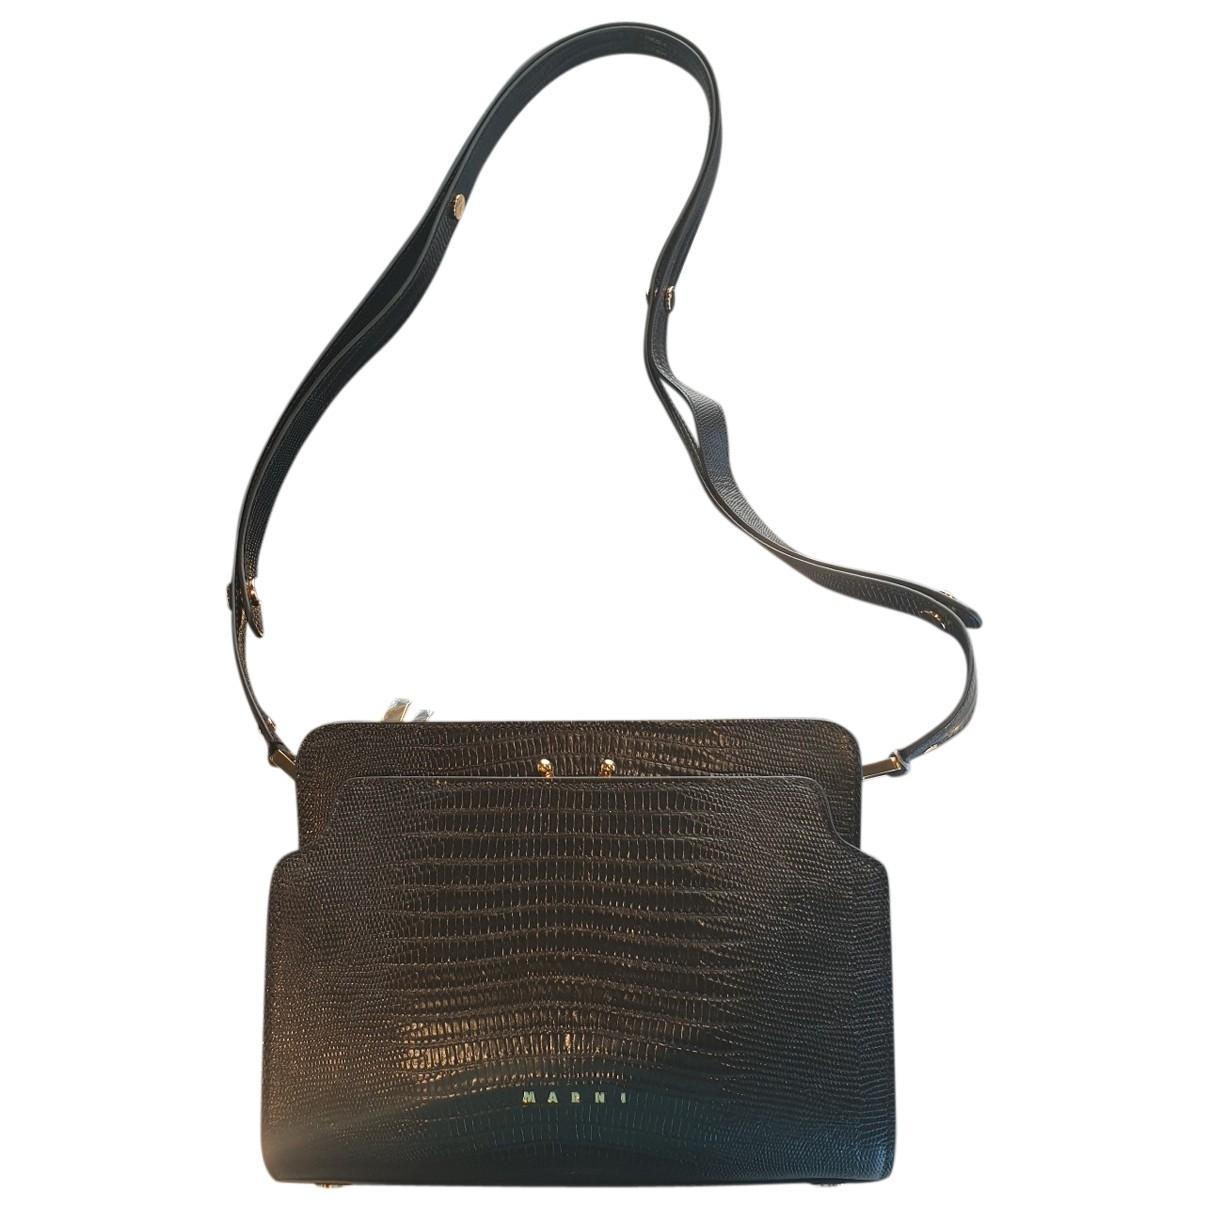 Marni \N Black Crocodile handbag for Women \N